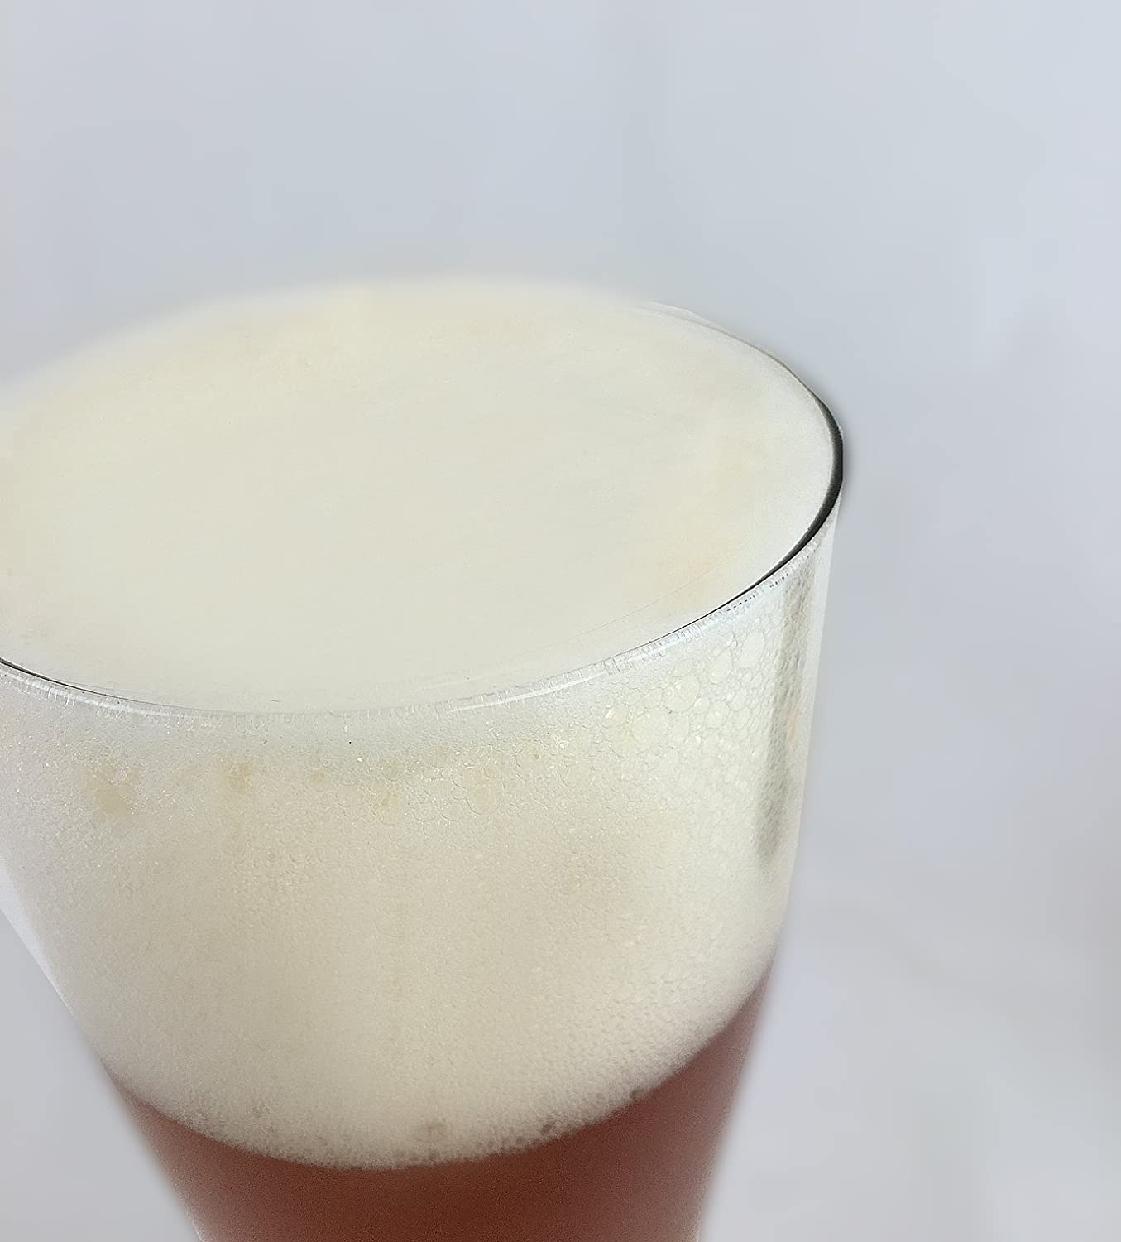 ADERIA(アデリア) 薄吹き ビアグラス Lの商品画像4